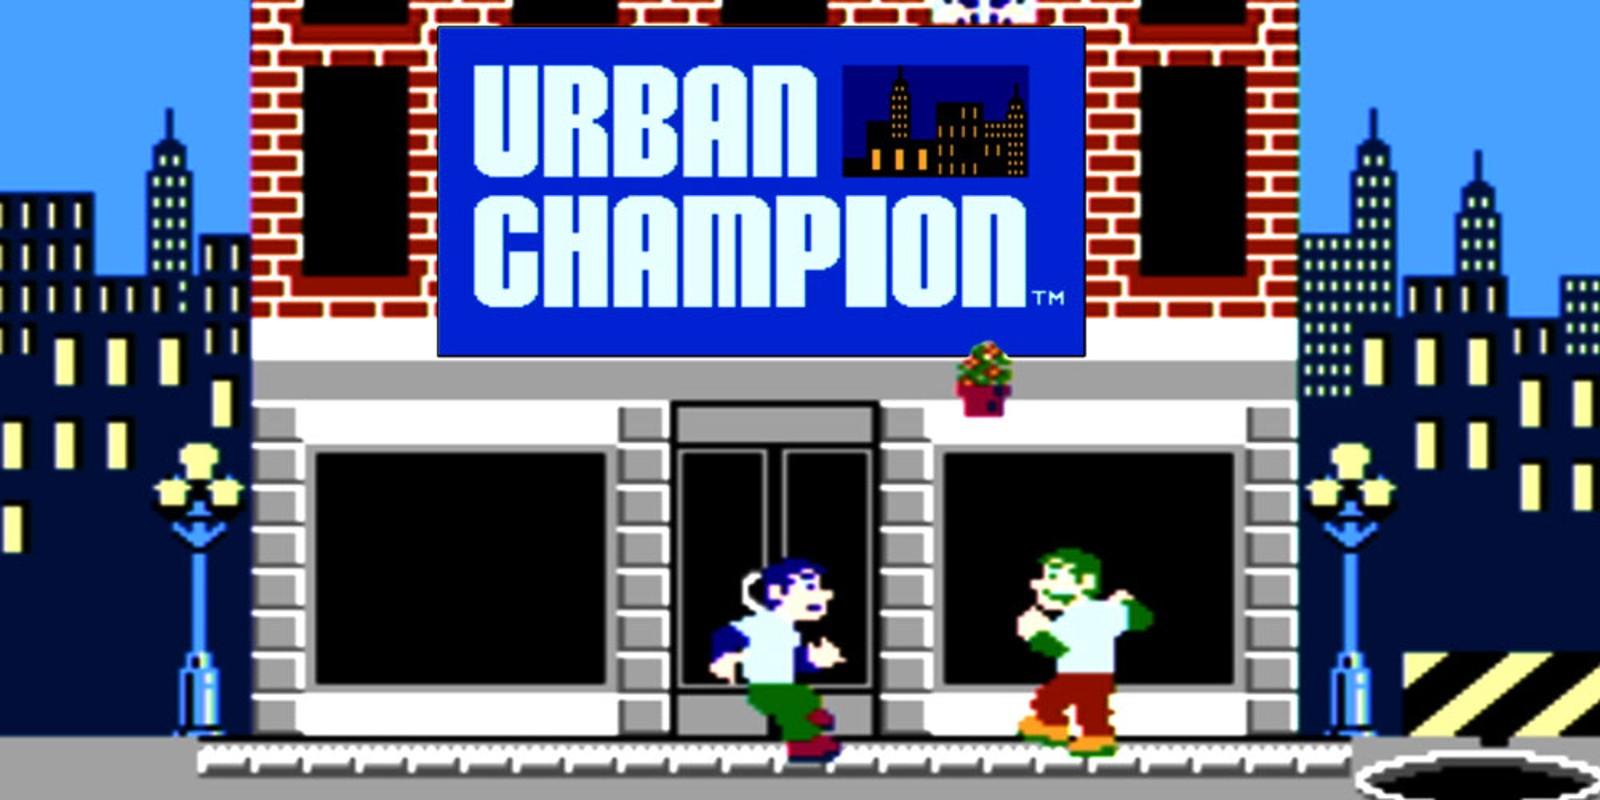 Image result for urban champion nes